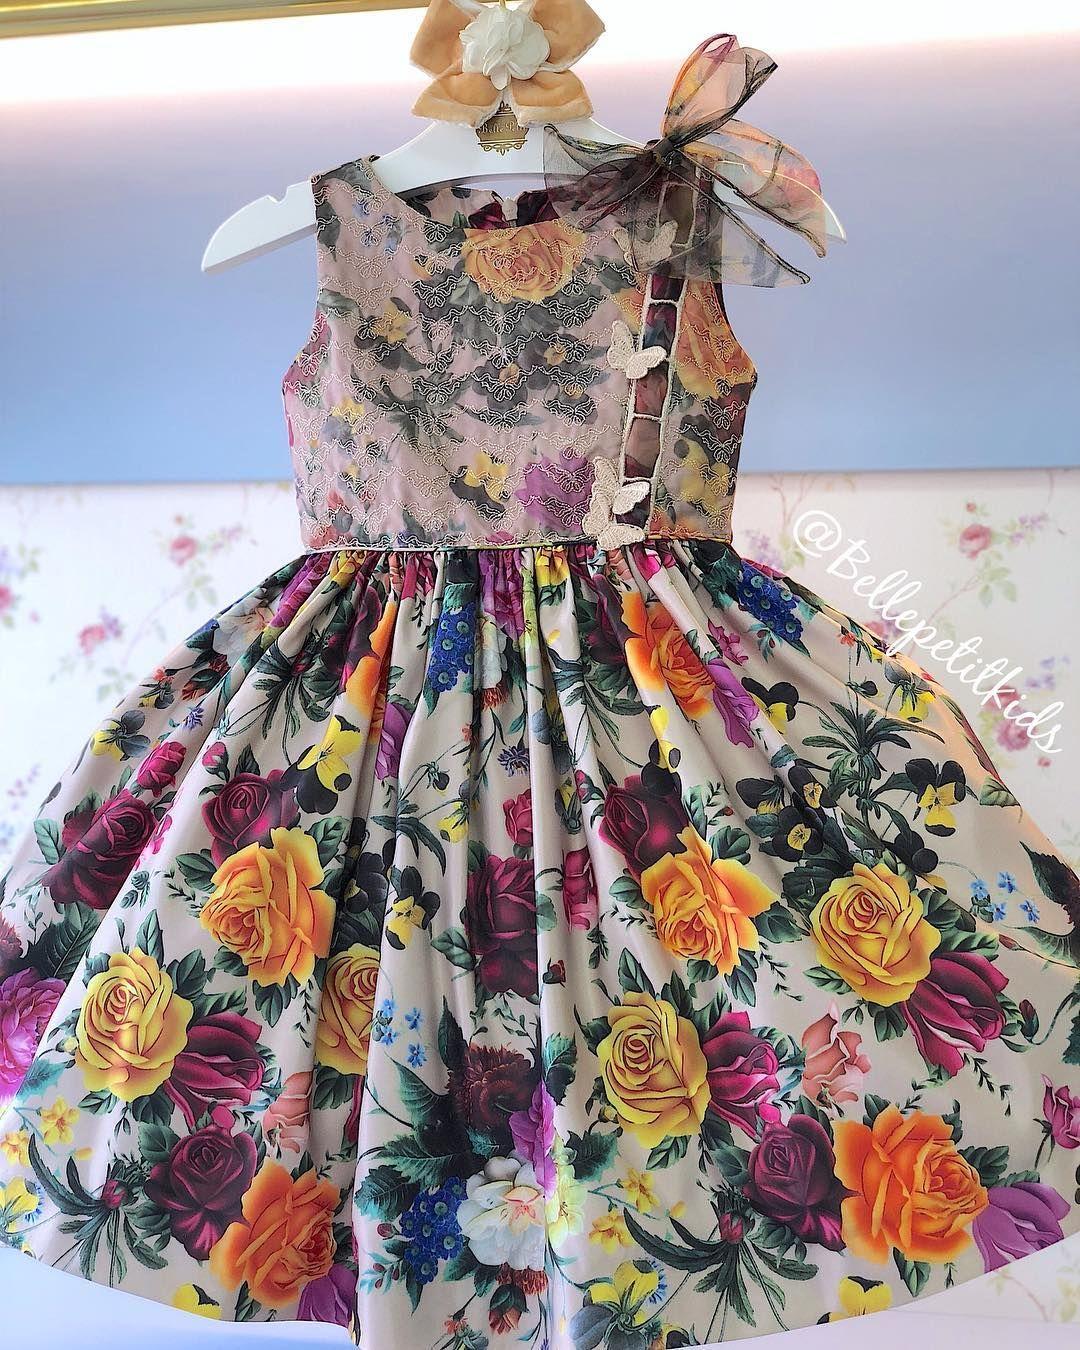 2bf146554 Vestido Mio Bebê dos sonhos! No tecido bucol estampado bordado com  borboletas ele esbanja muita